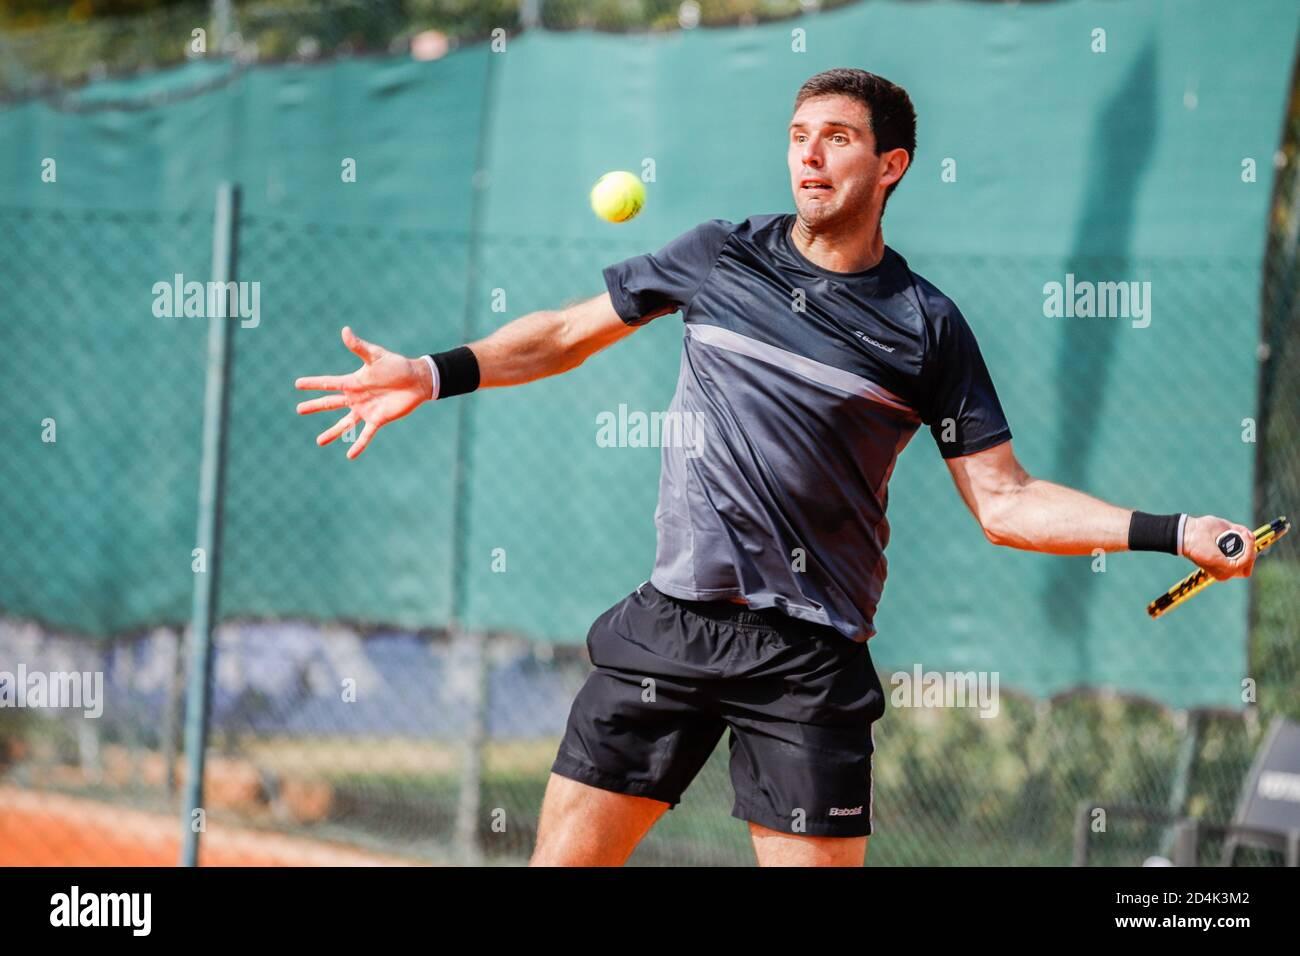 parma, Italia, 09 Oct 2020, Federico Delbonis durante ATP Challenger 125 - Internazionali Emilia Romagna, Tenis Internationals - crédito: LM/Roberta Corradin/Alamy Live News Foto de stock